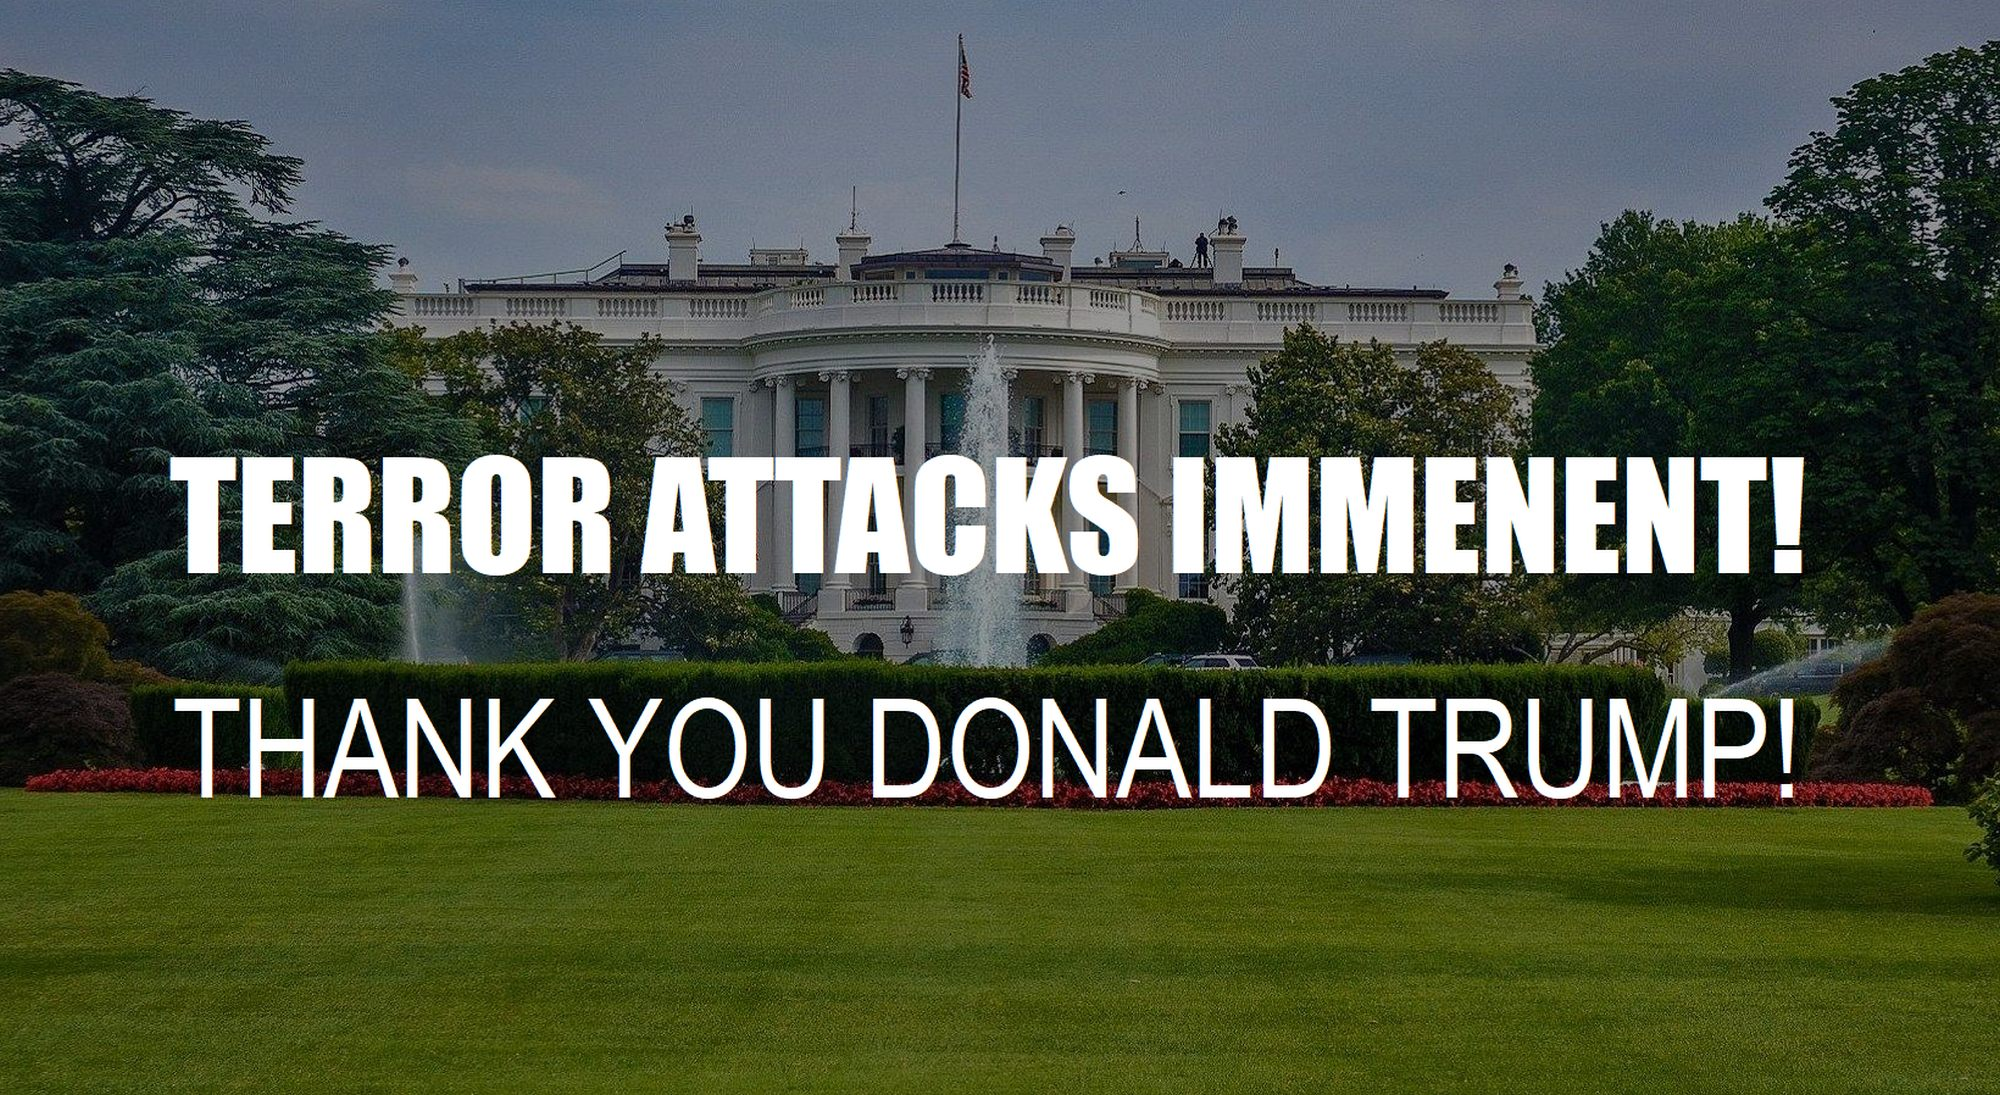 Capitol represents question will-more-terrorists-attack-will-violent-trump-supporter-attacks-escalate-or-turn-into-war